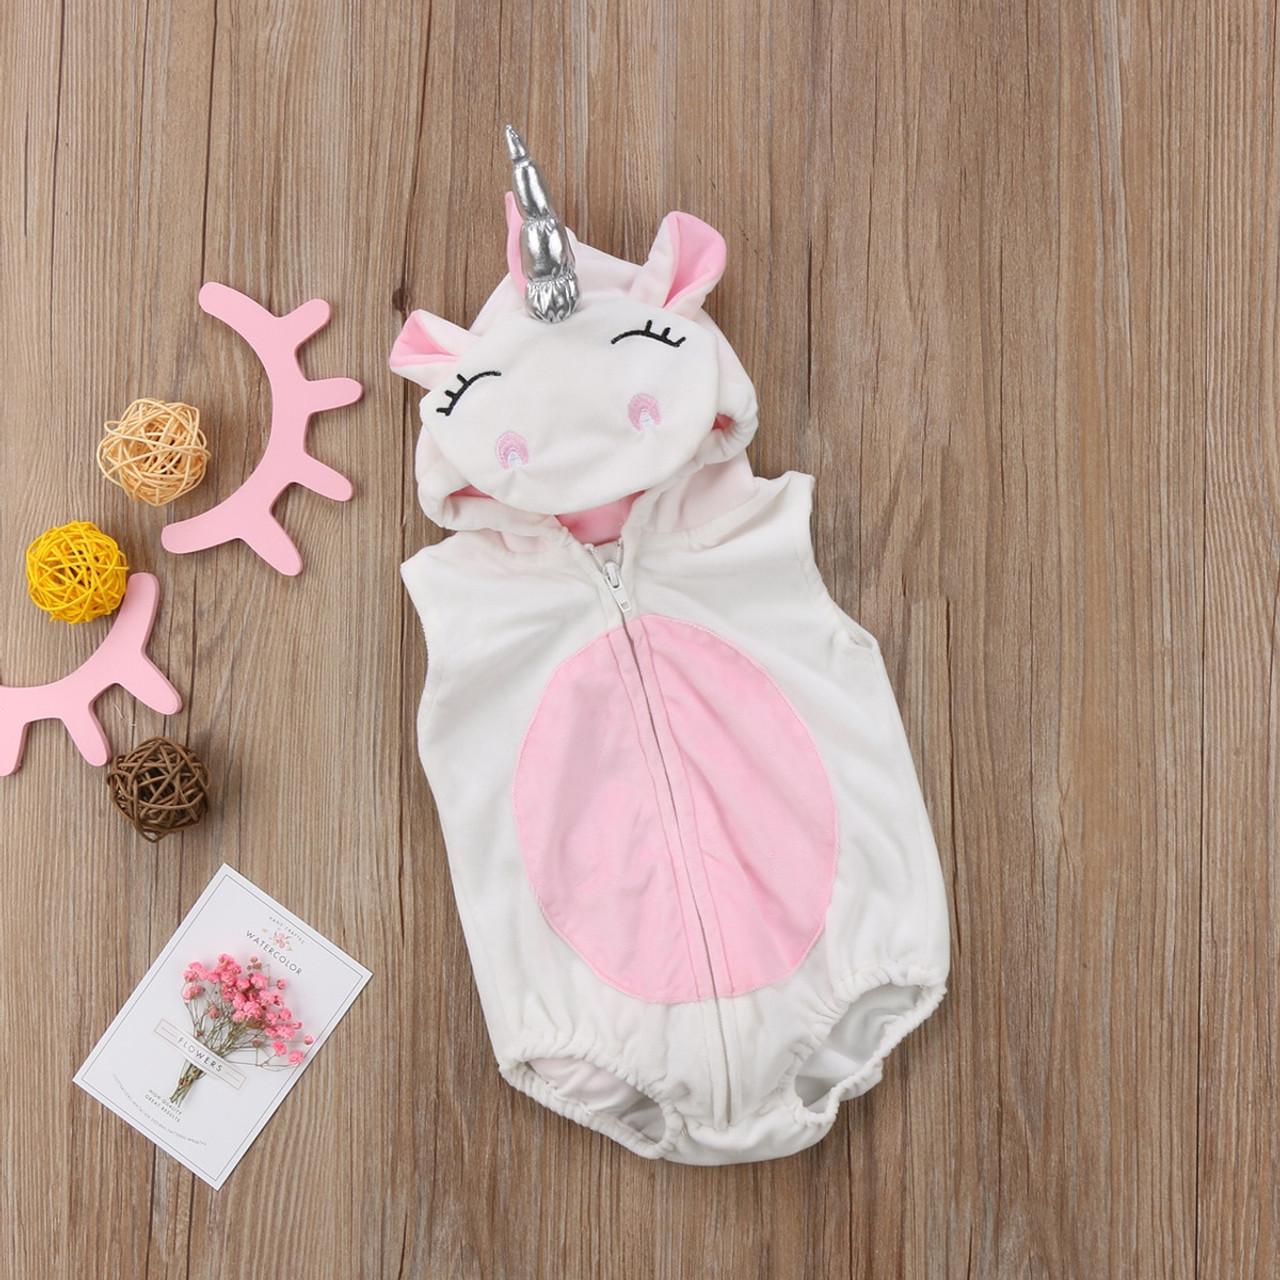 ae574edae8a1 Toddler Newborn Unicorn Baby Girls Fleece Romper Jumpsuit Jumper ...